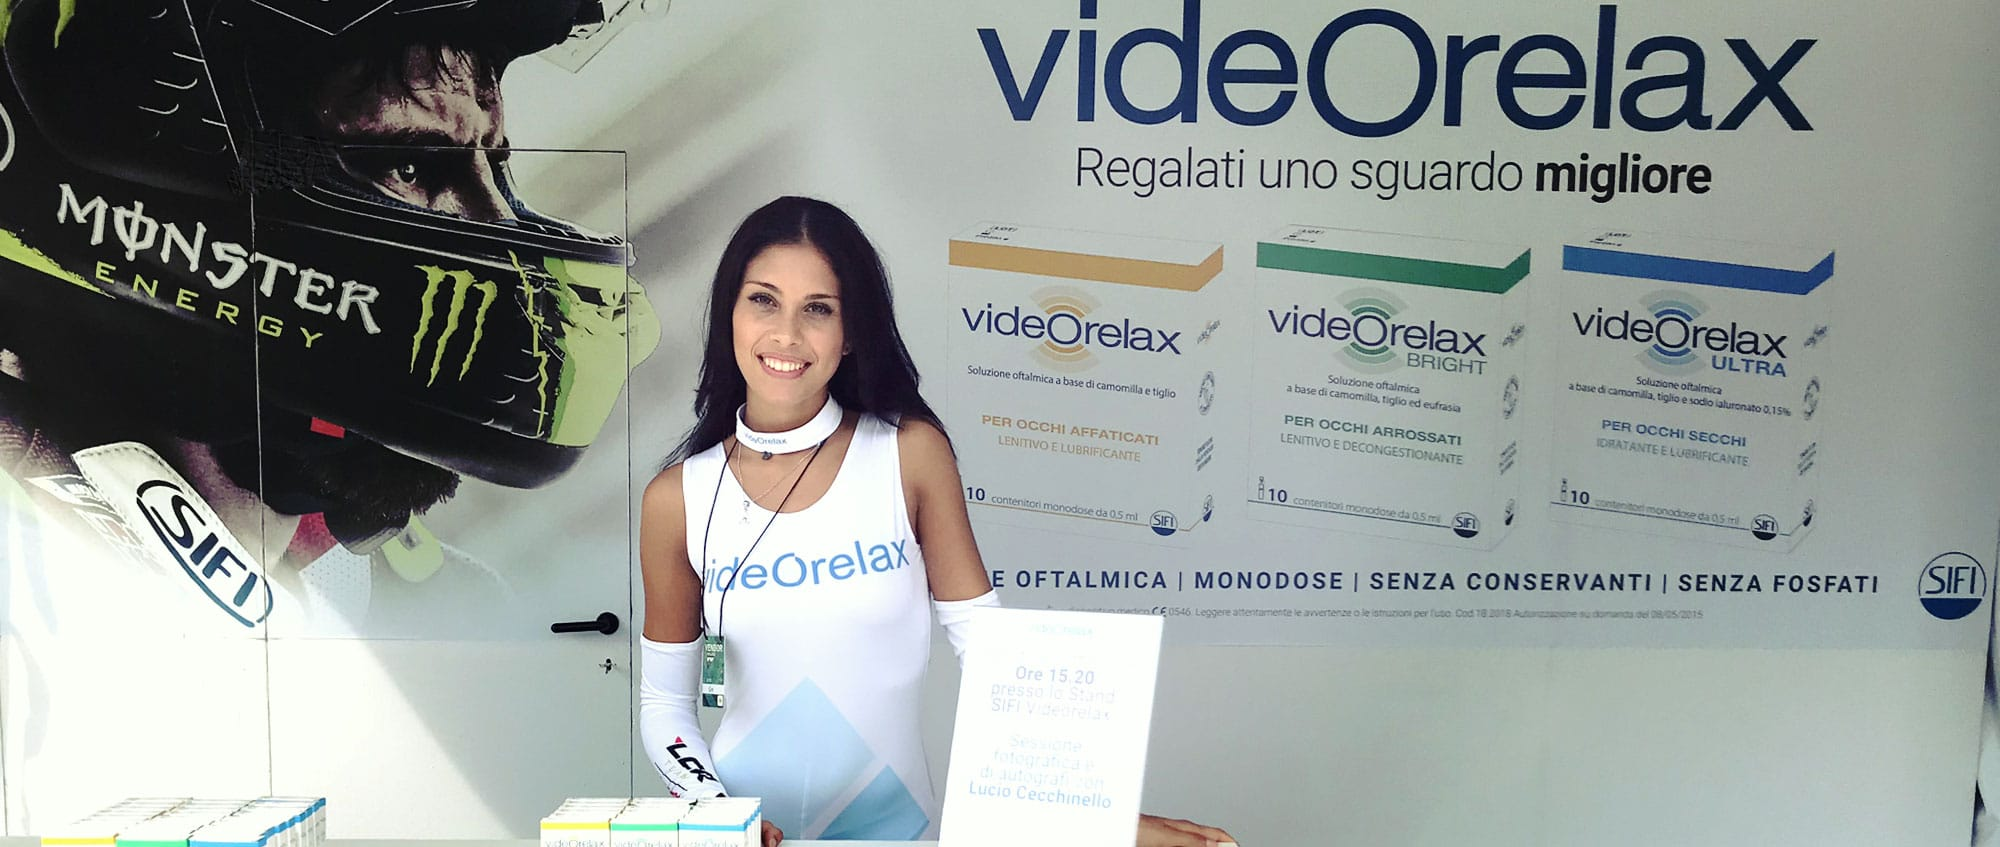 VideoRelax Stand